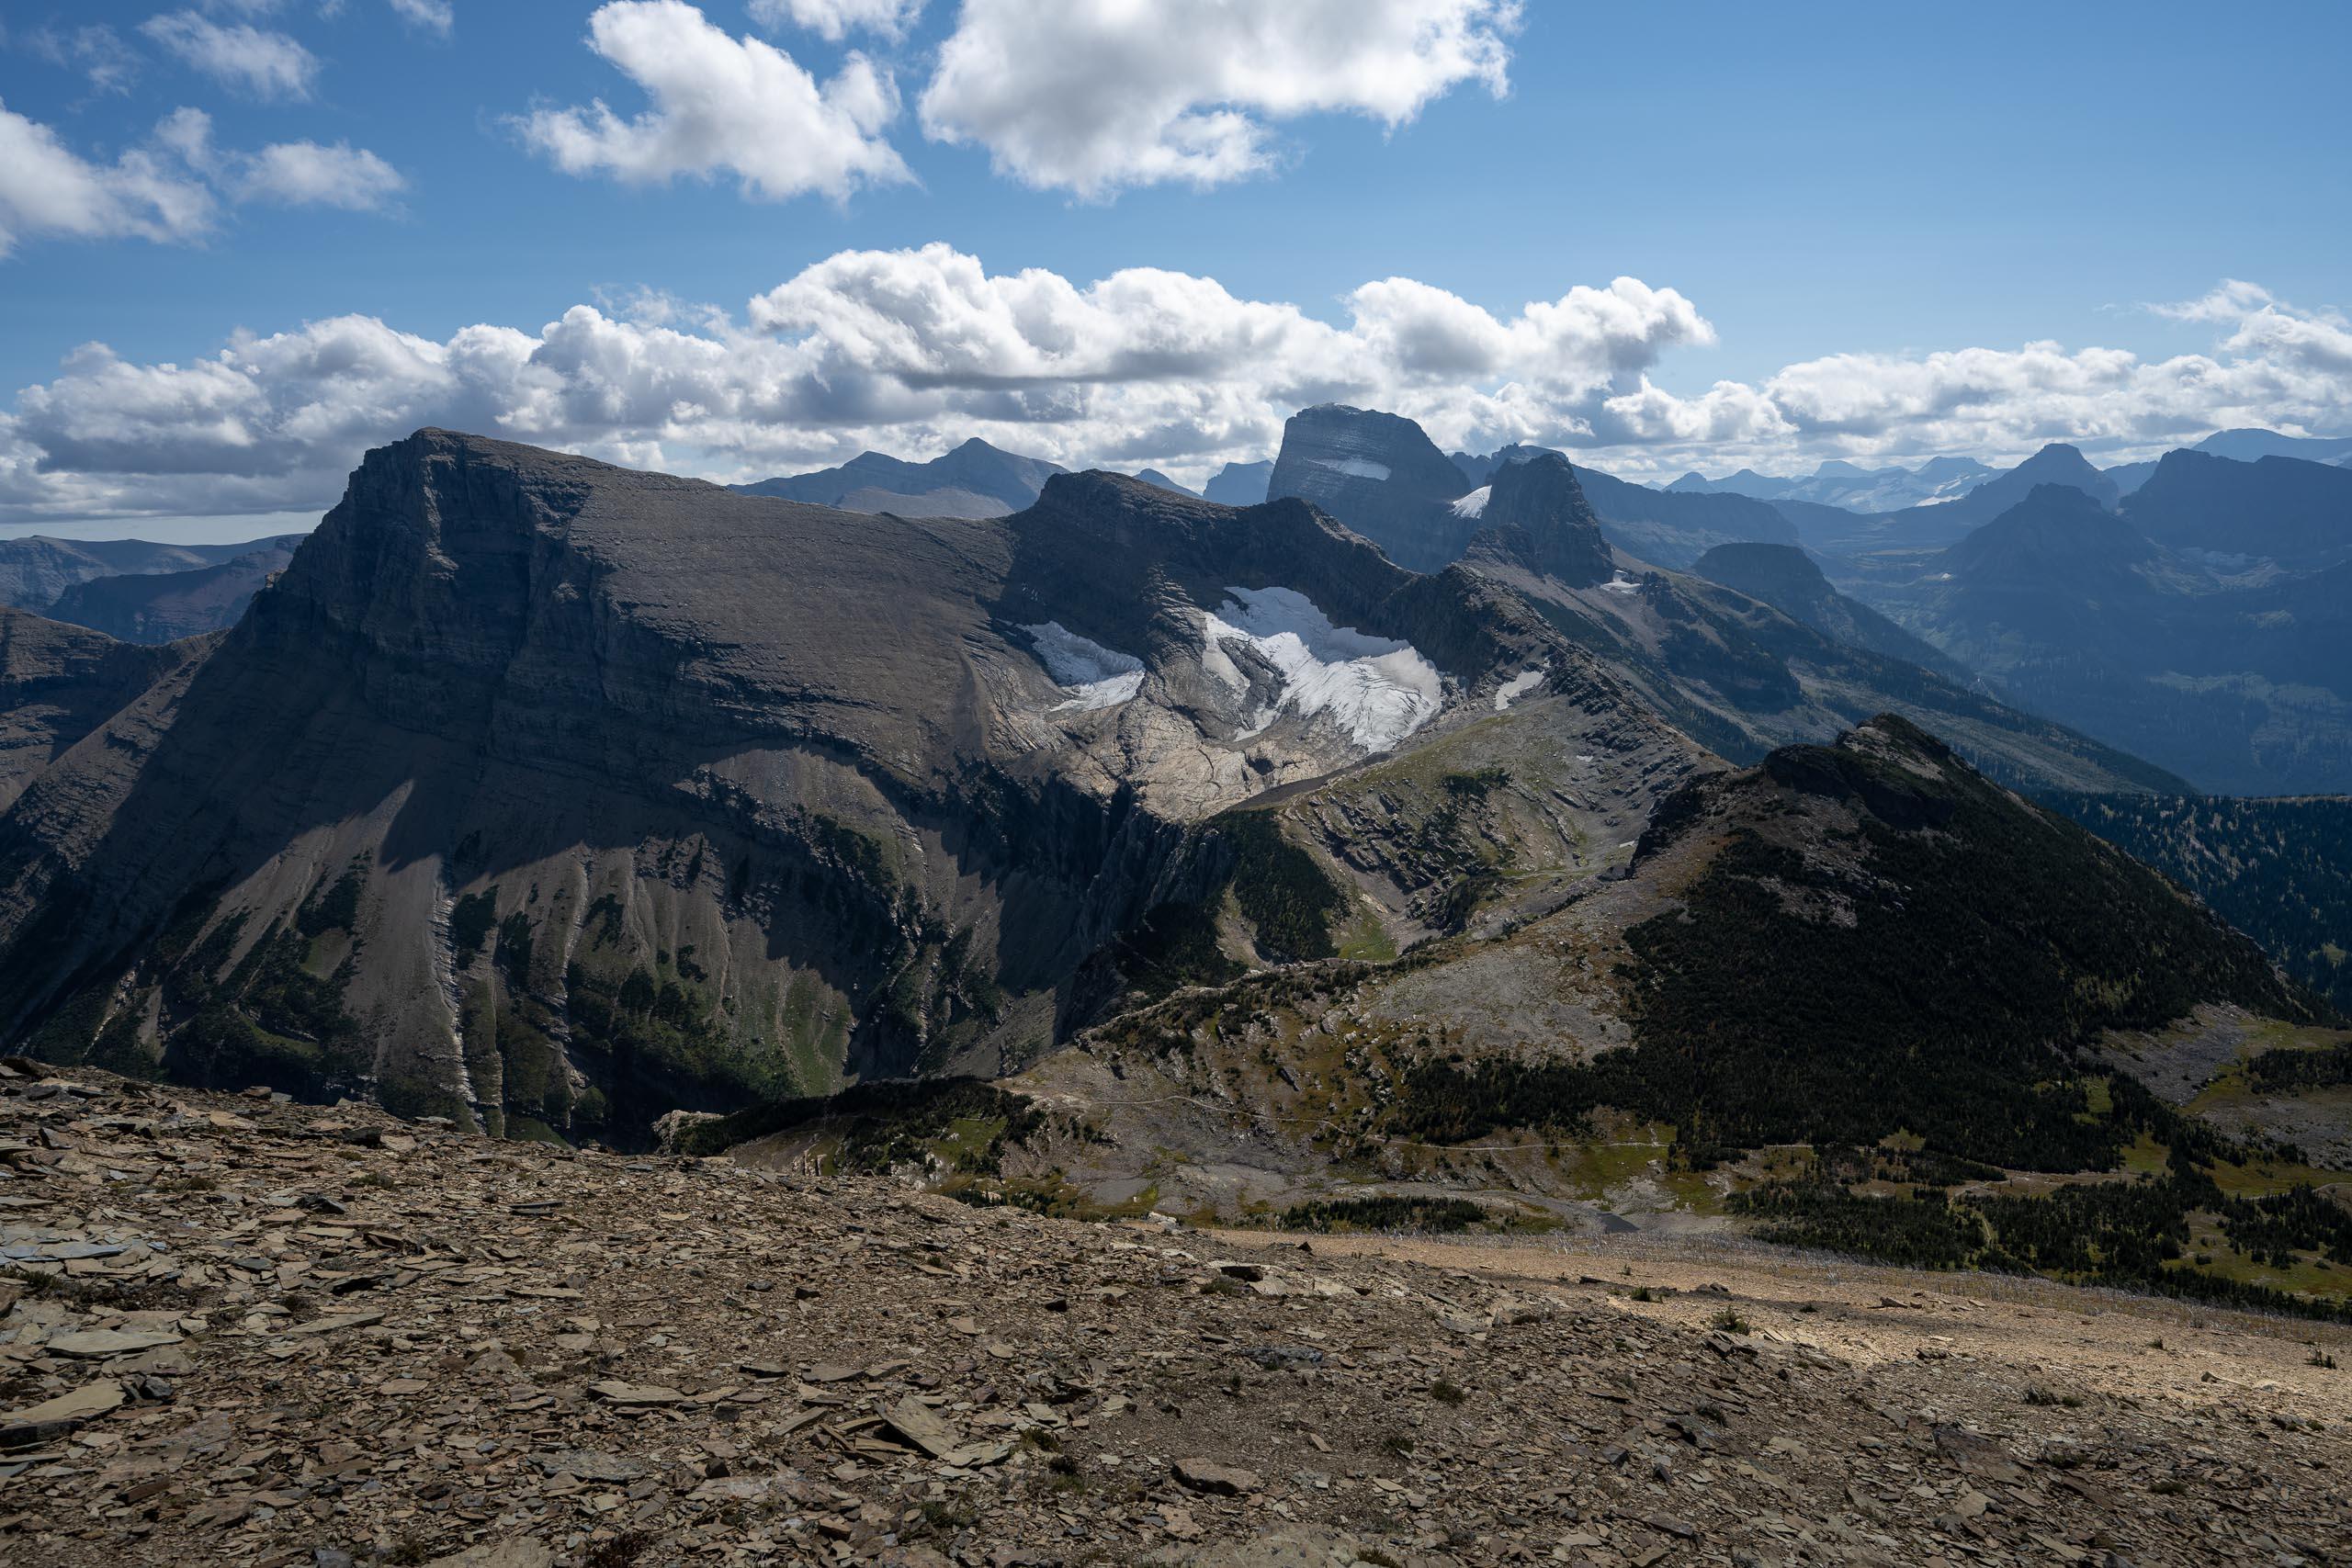 Swiftcurrent Glacier & Mt. Gould